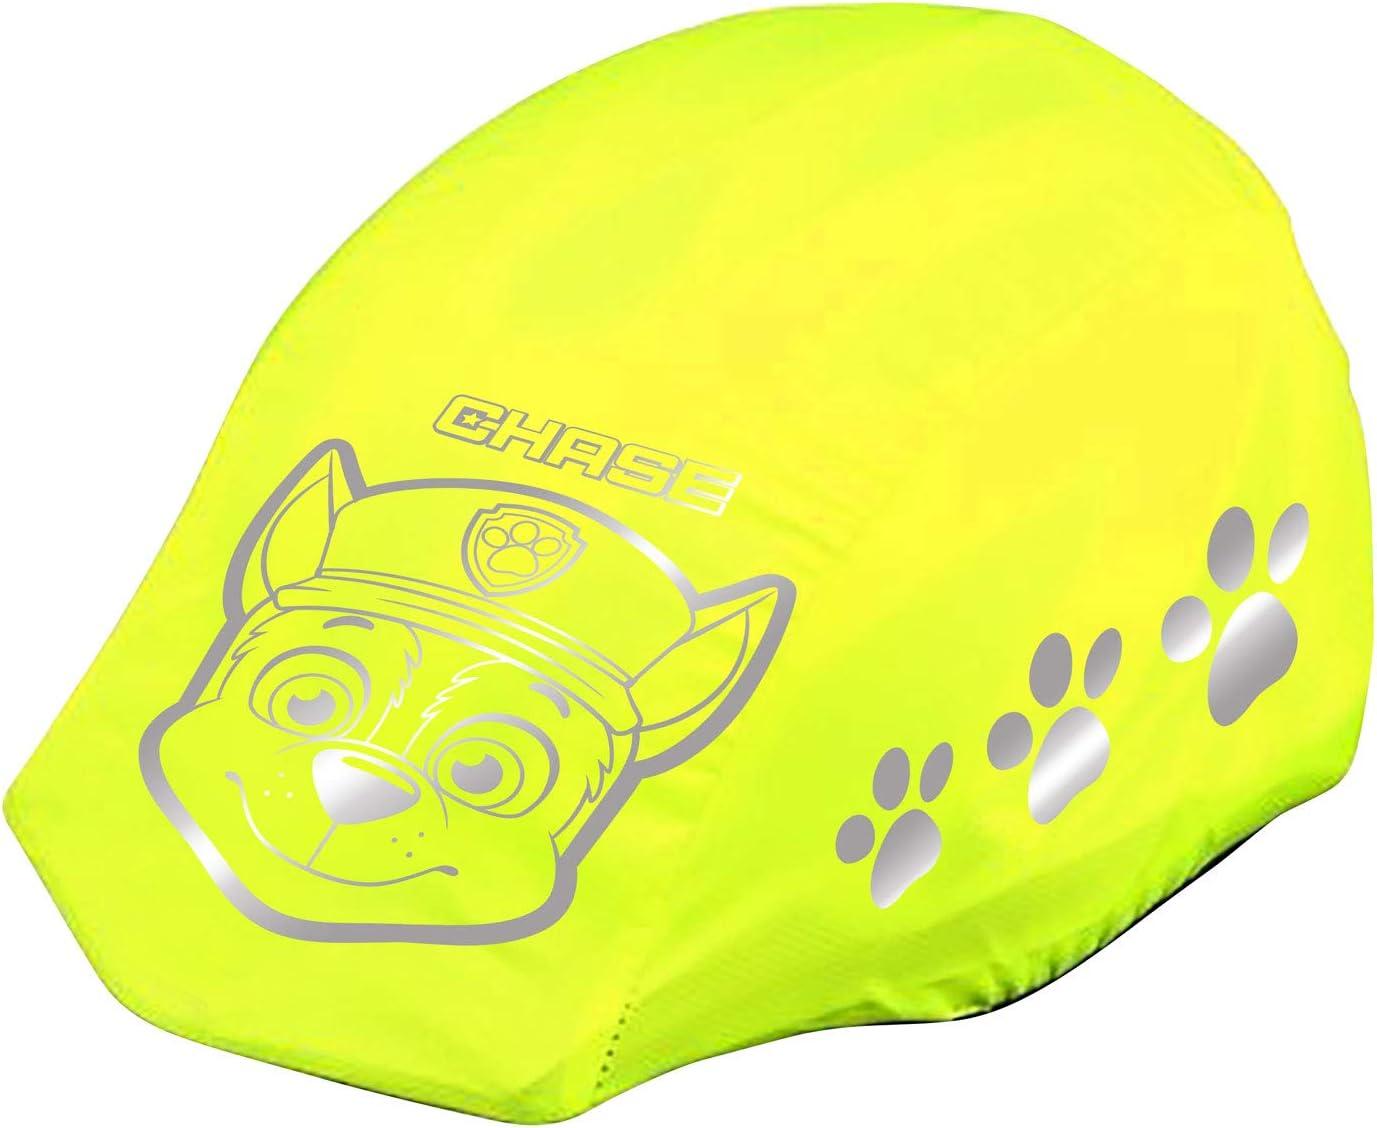 Anti-Regen Fugift Regenschutzfolie Patch-Bildschirm f/ür K3 K4 AX8 LS2 HJC MT Helme Regenschutz Universal Motorradhelm transparent